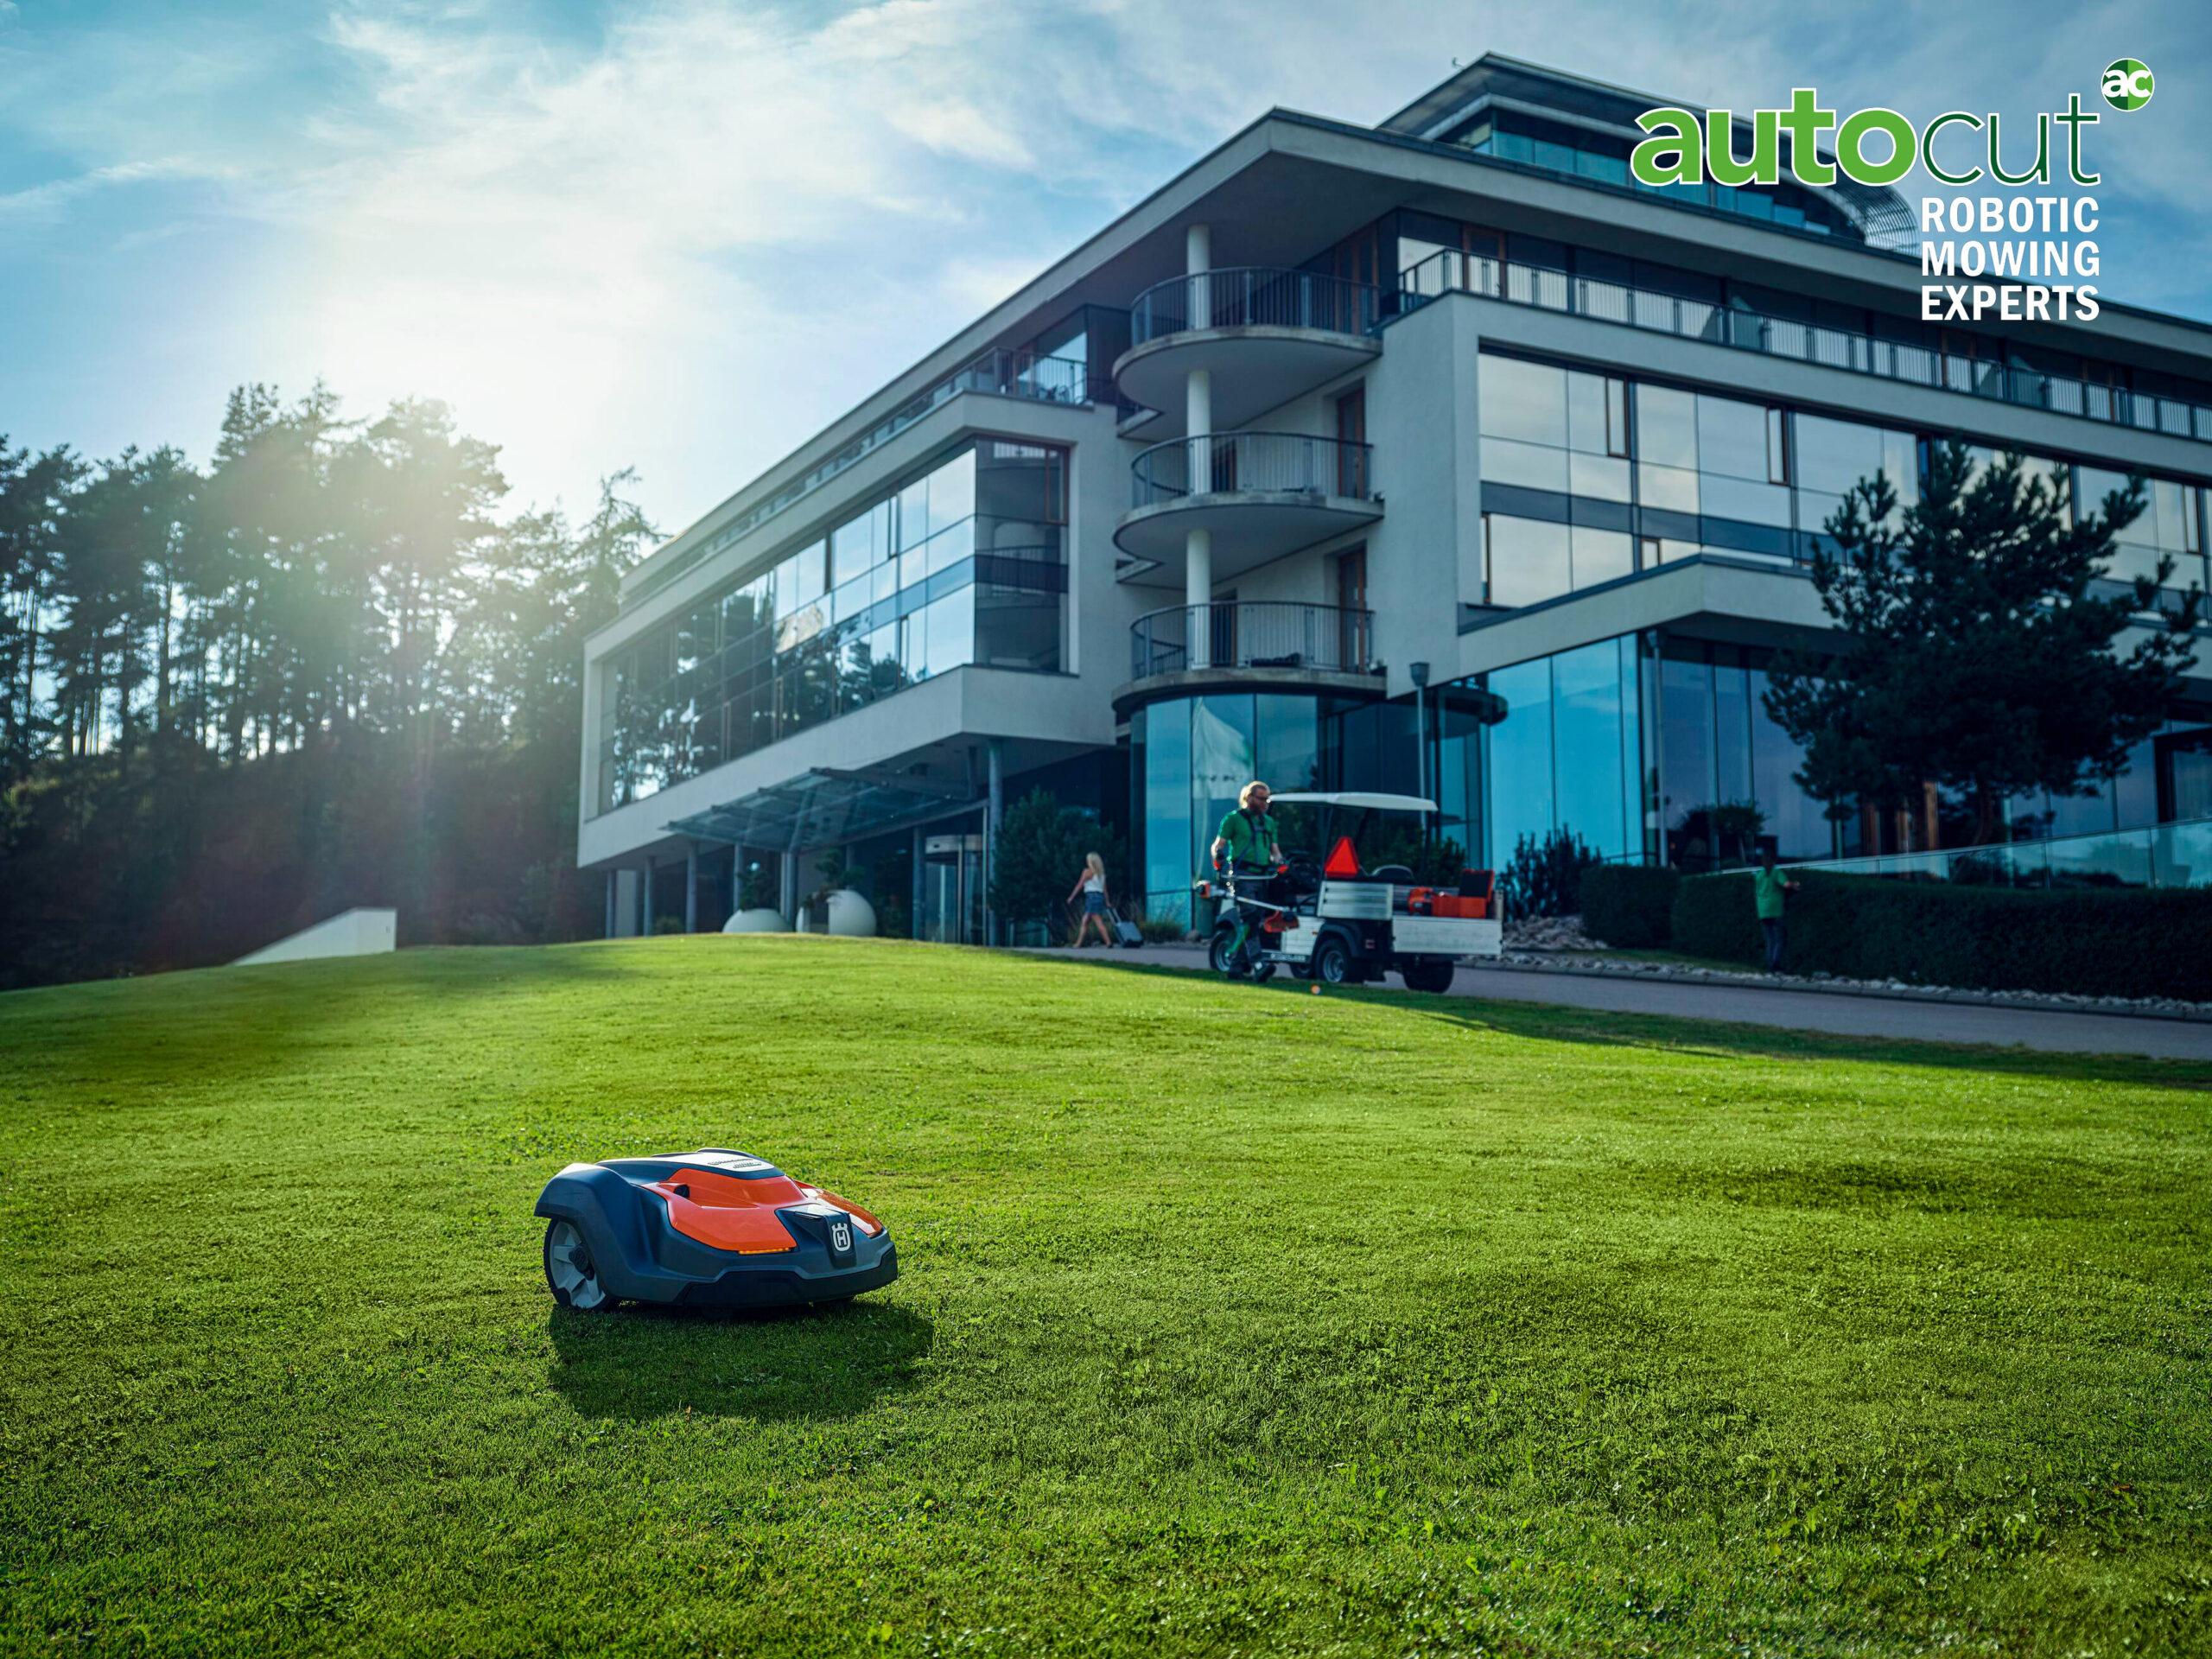 Meet the Mower: Automower® 550 EPOS